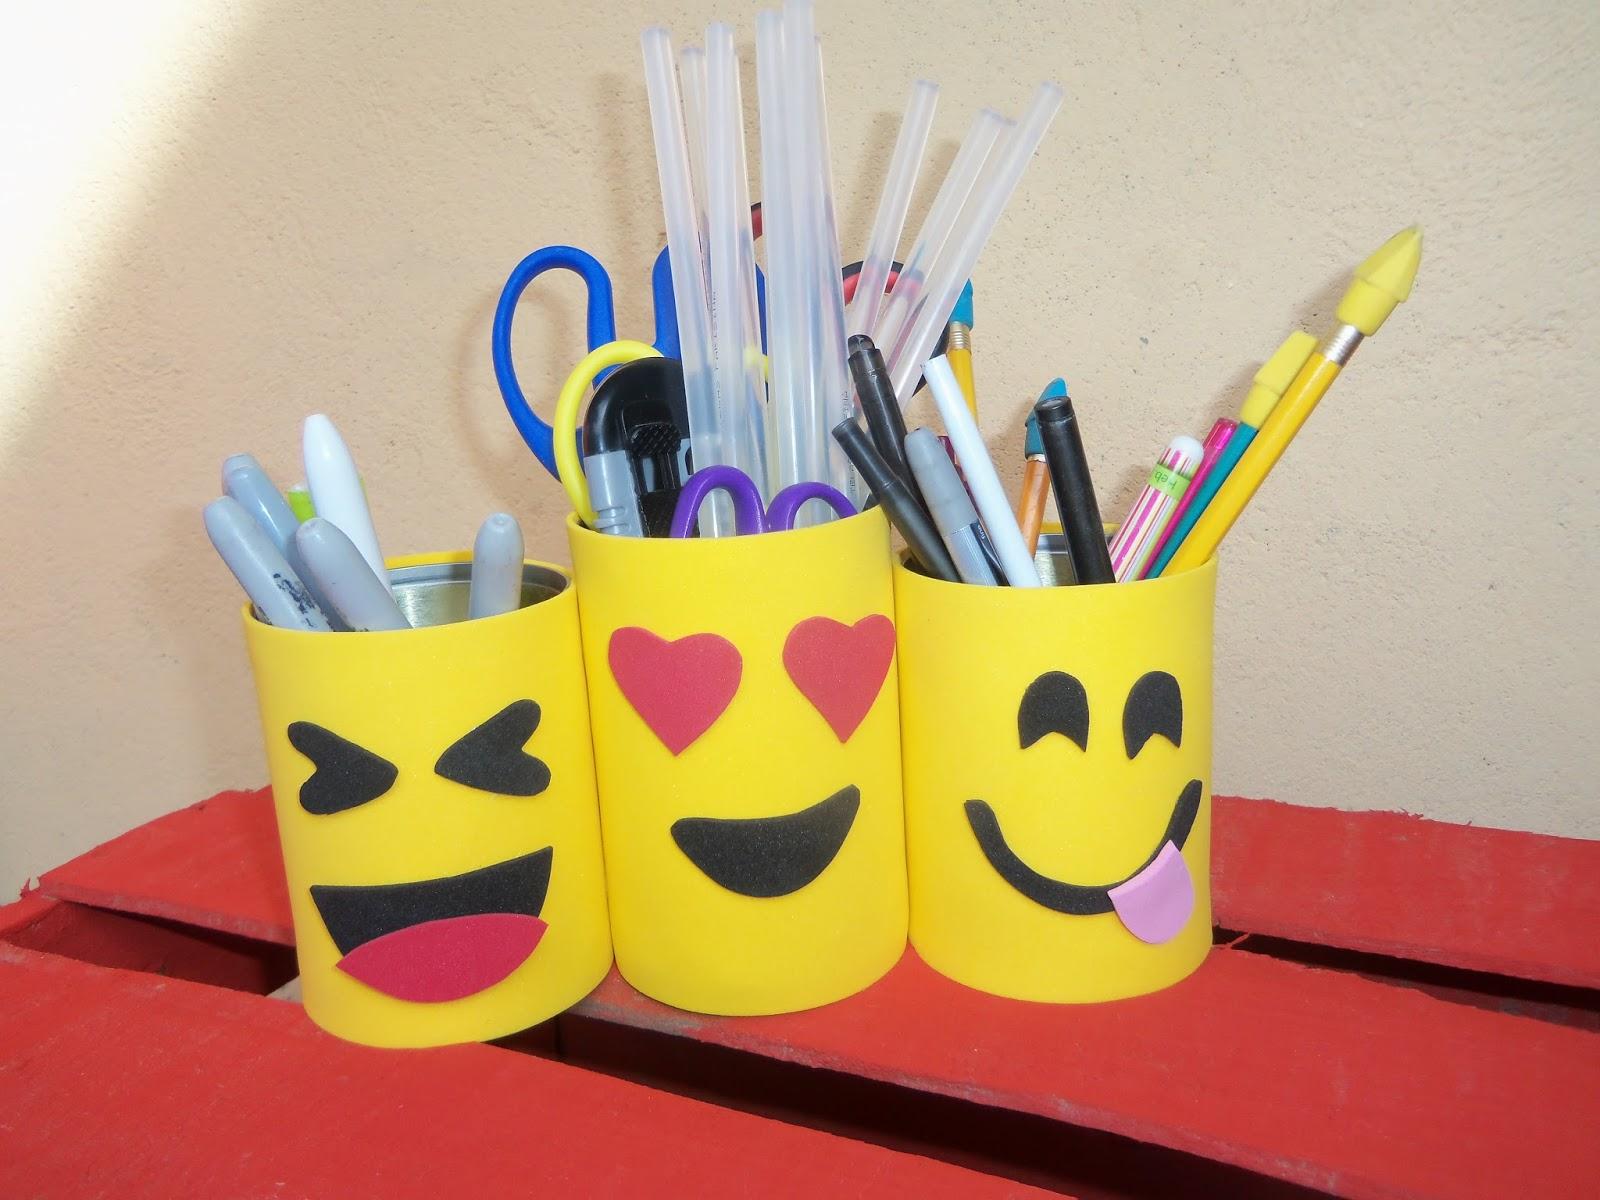 Miizzmagdiizz1 lapiceros de emojis manualidades de for Lapiceros reciclados manualidades